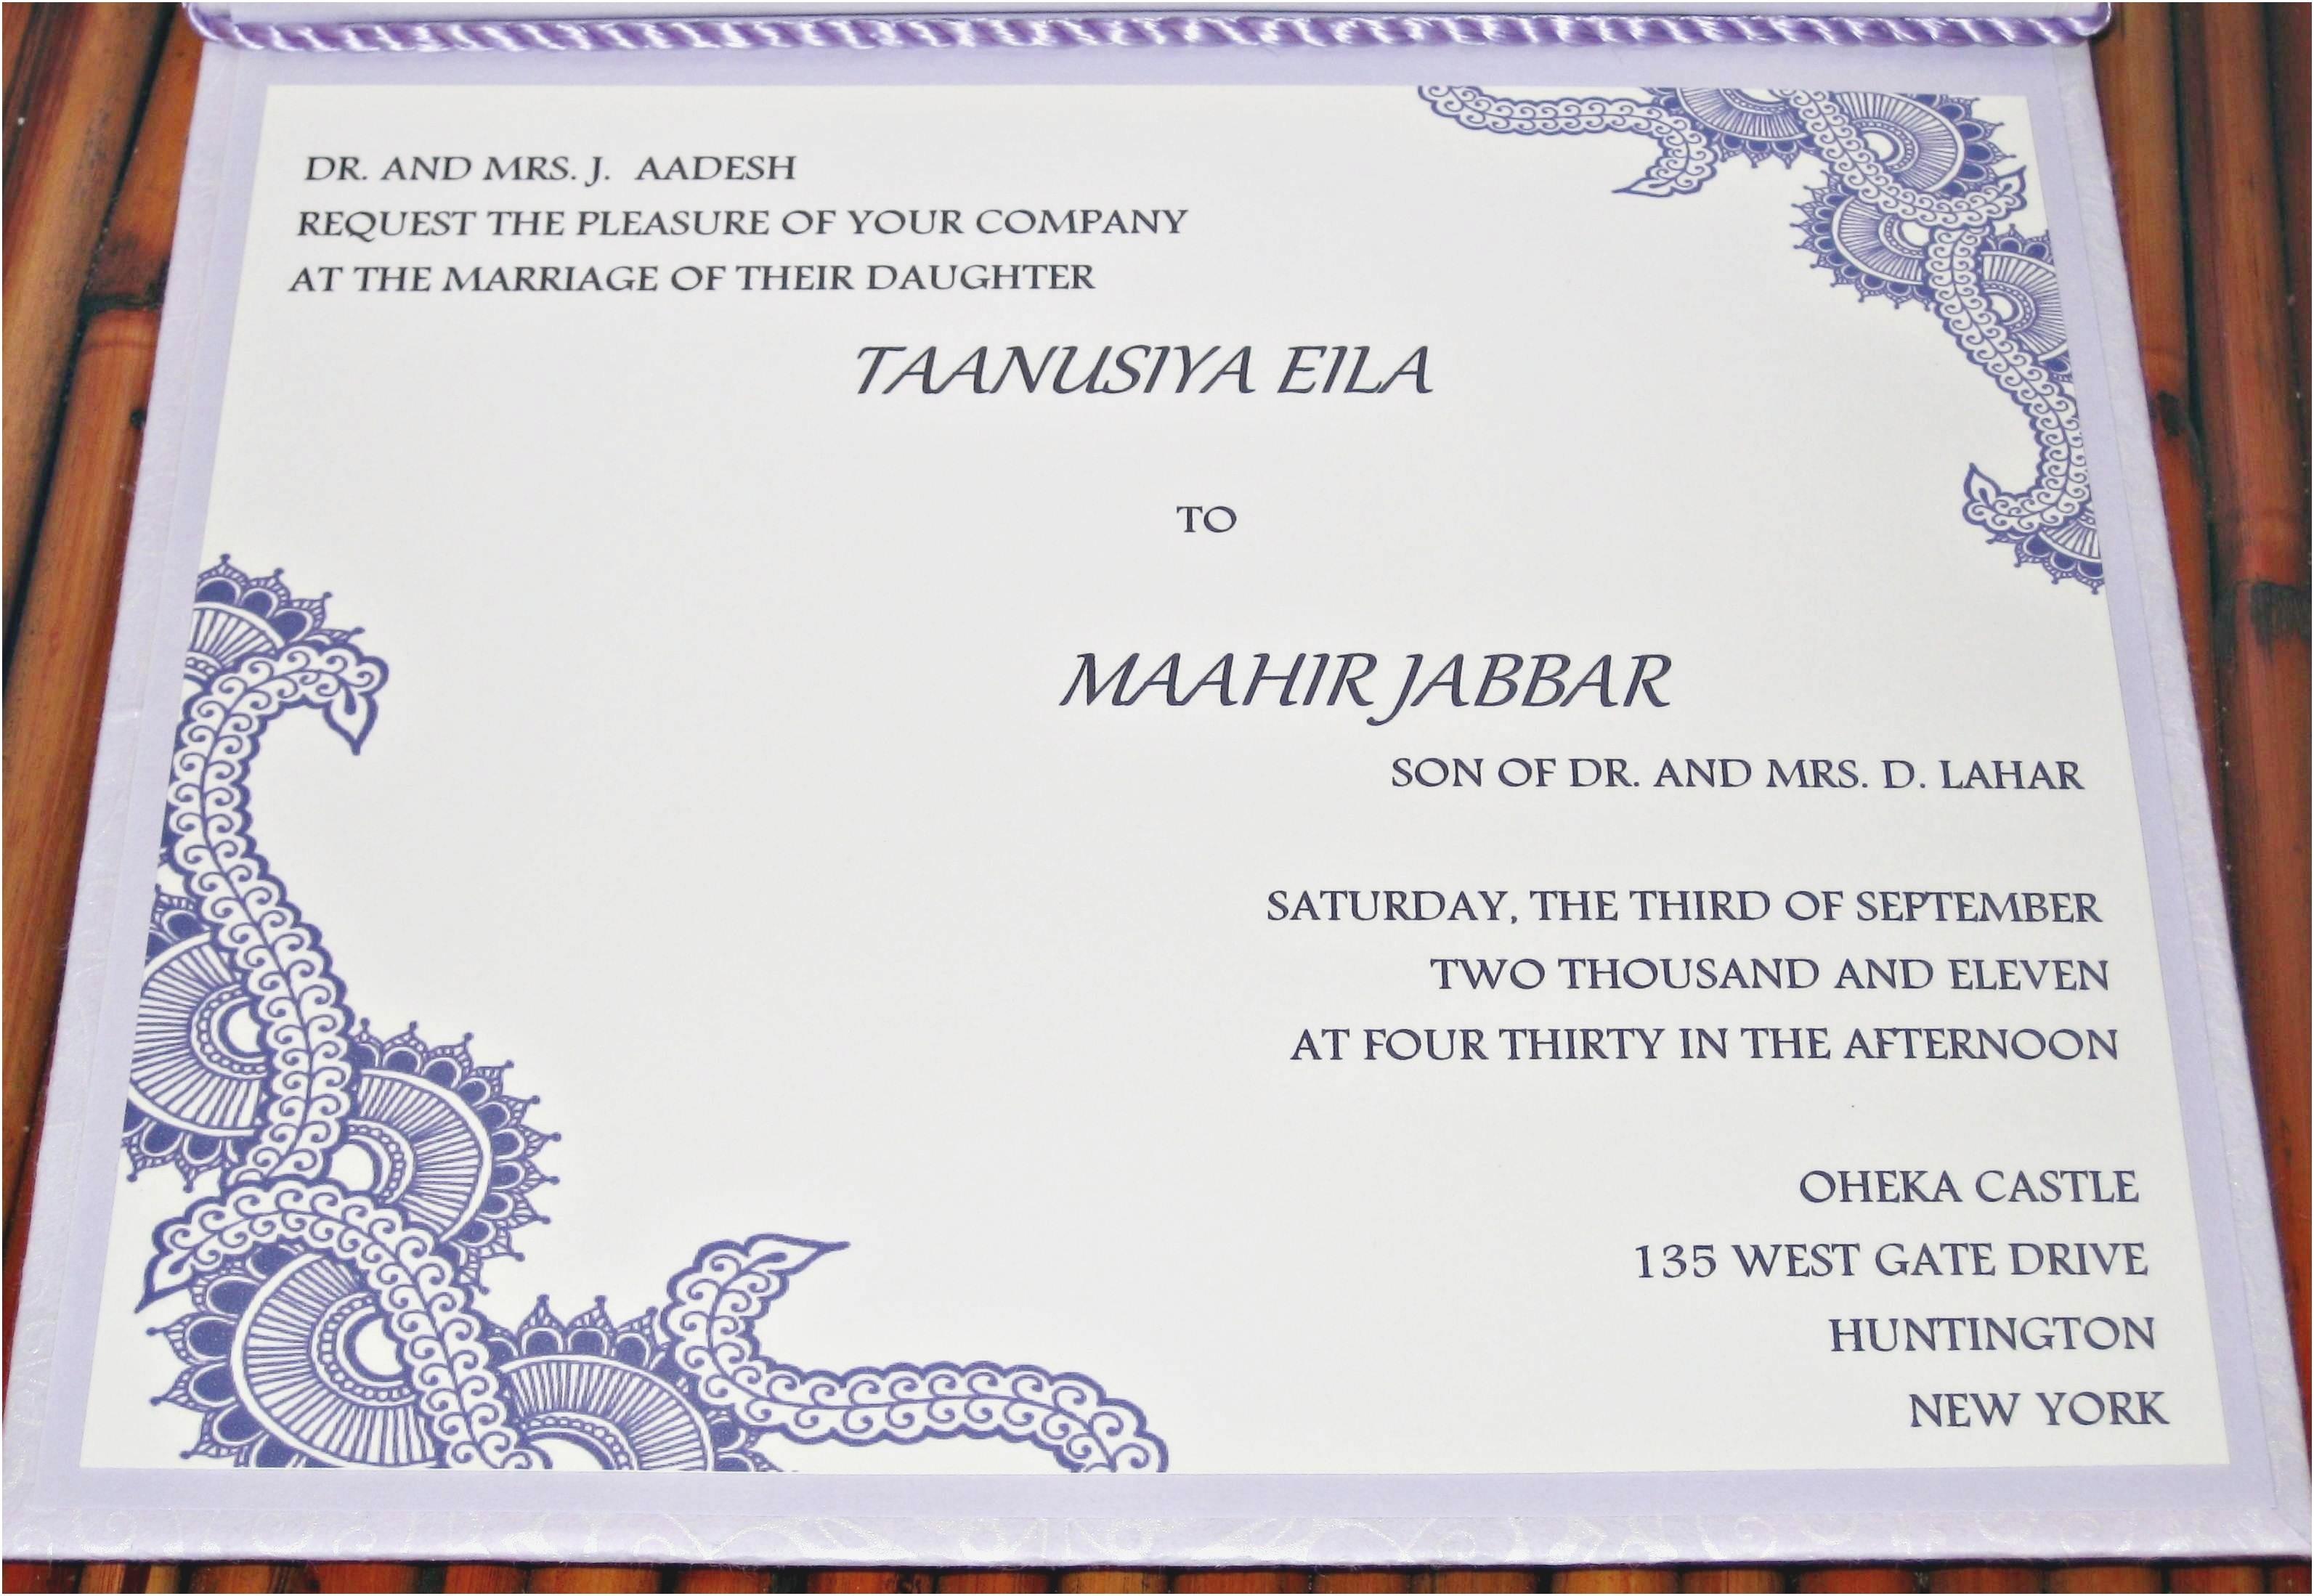 catholic wedding invitation wording sacrament unique beautiful wording for wedding program styles amp ideas 2018 stock